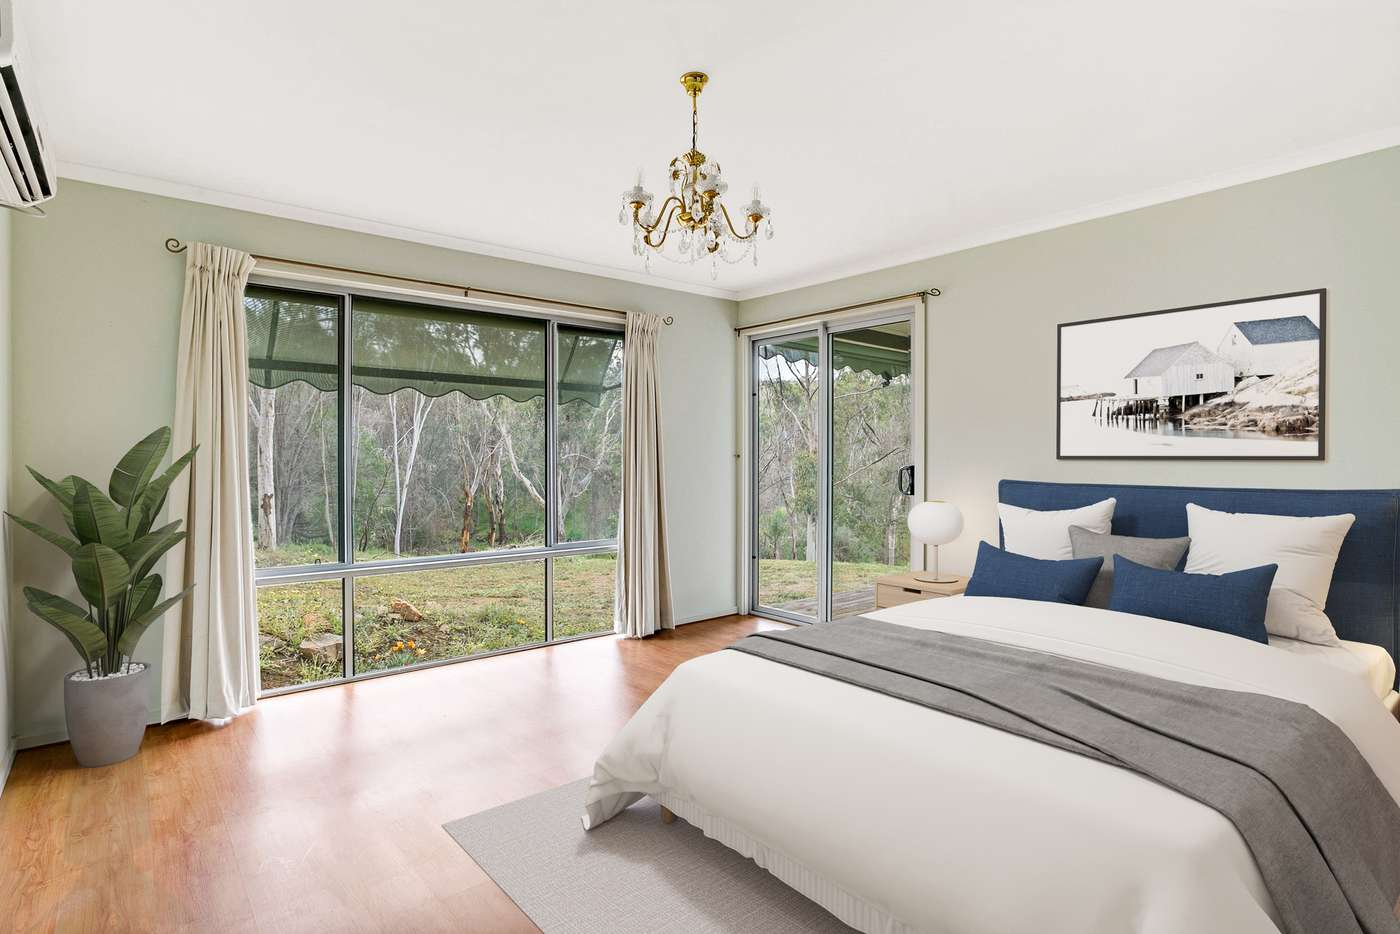 Sixth view of Homely house listing, 1390 Randell Road, Palmer SA 5237